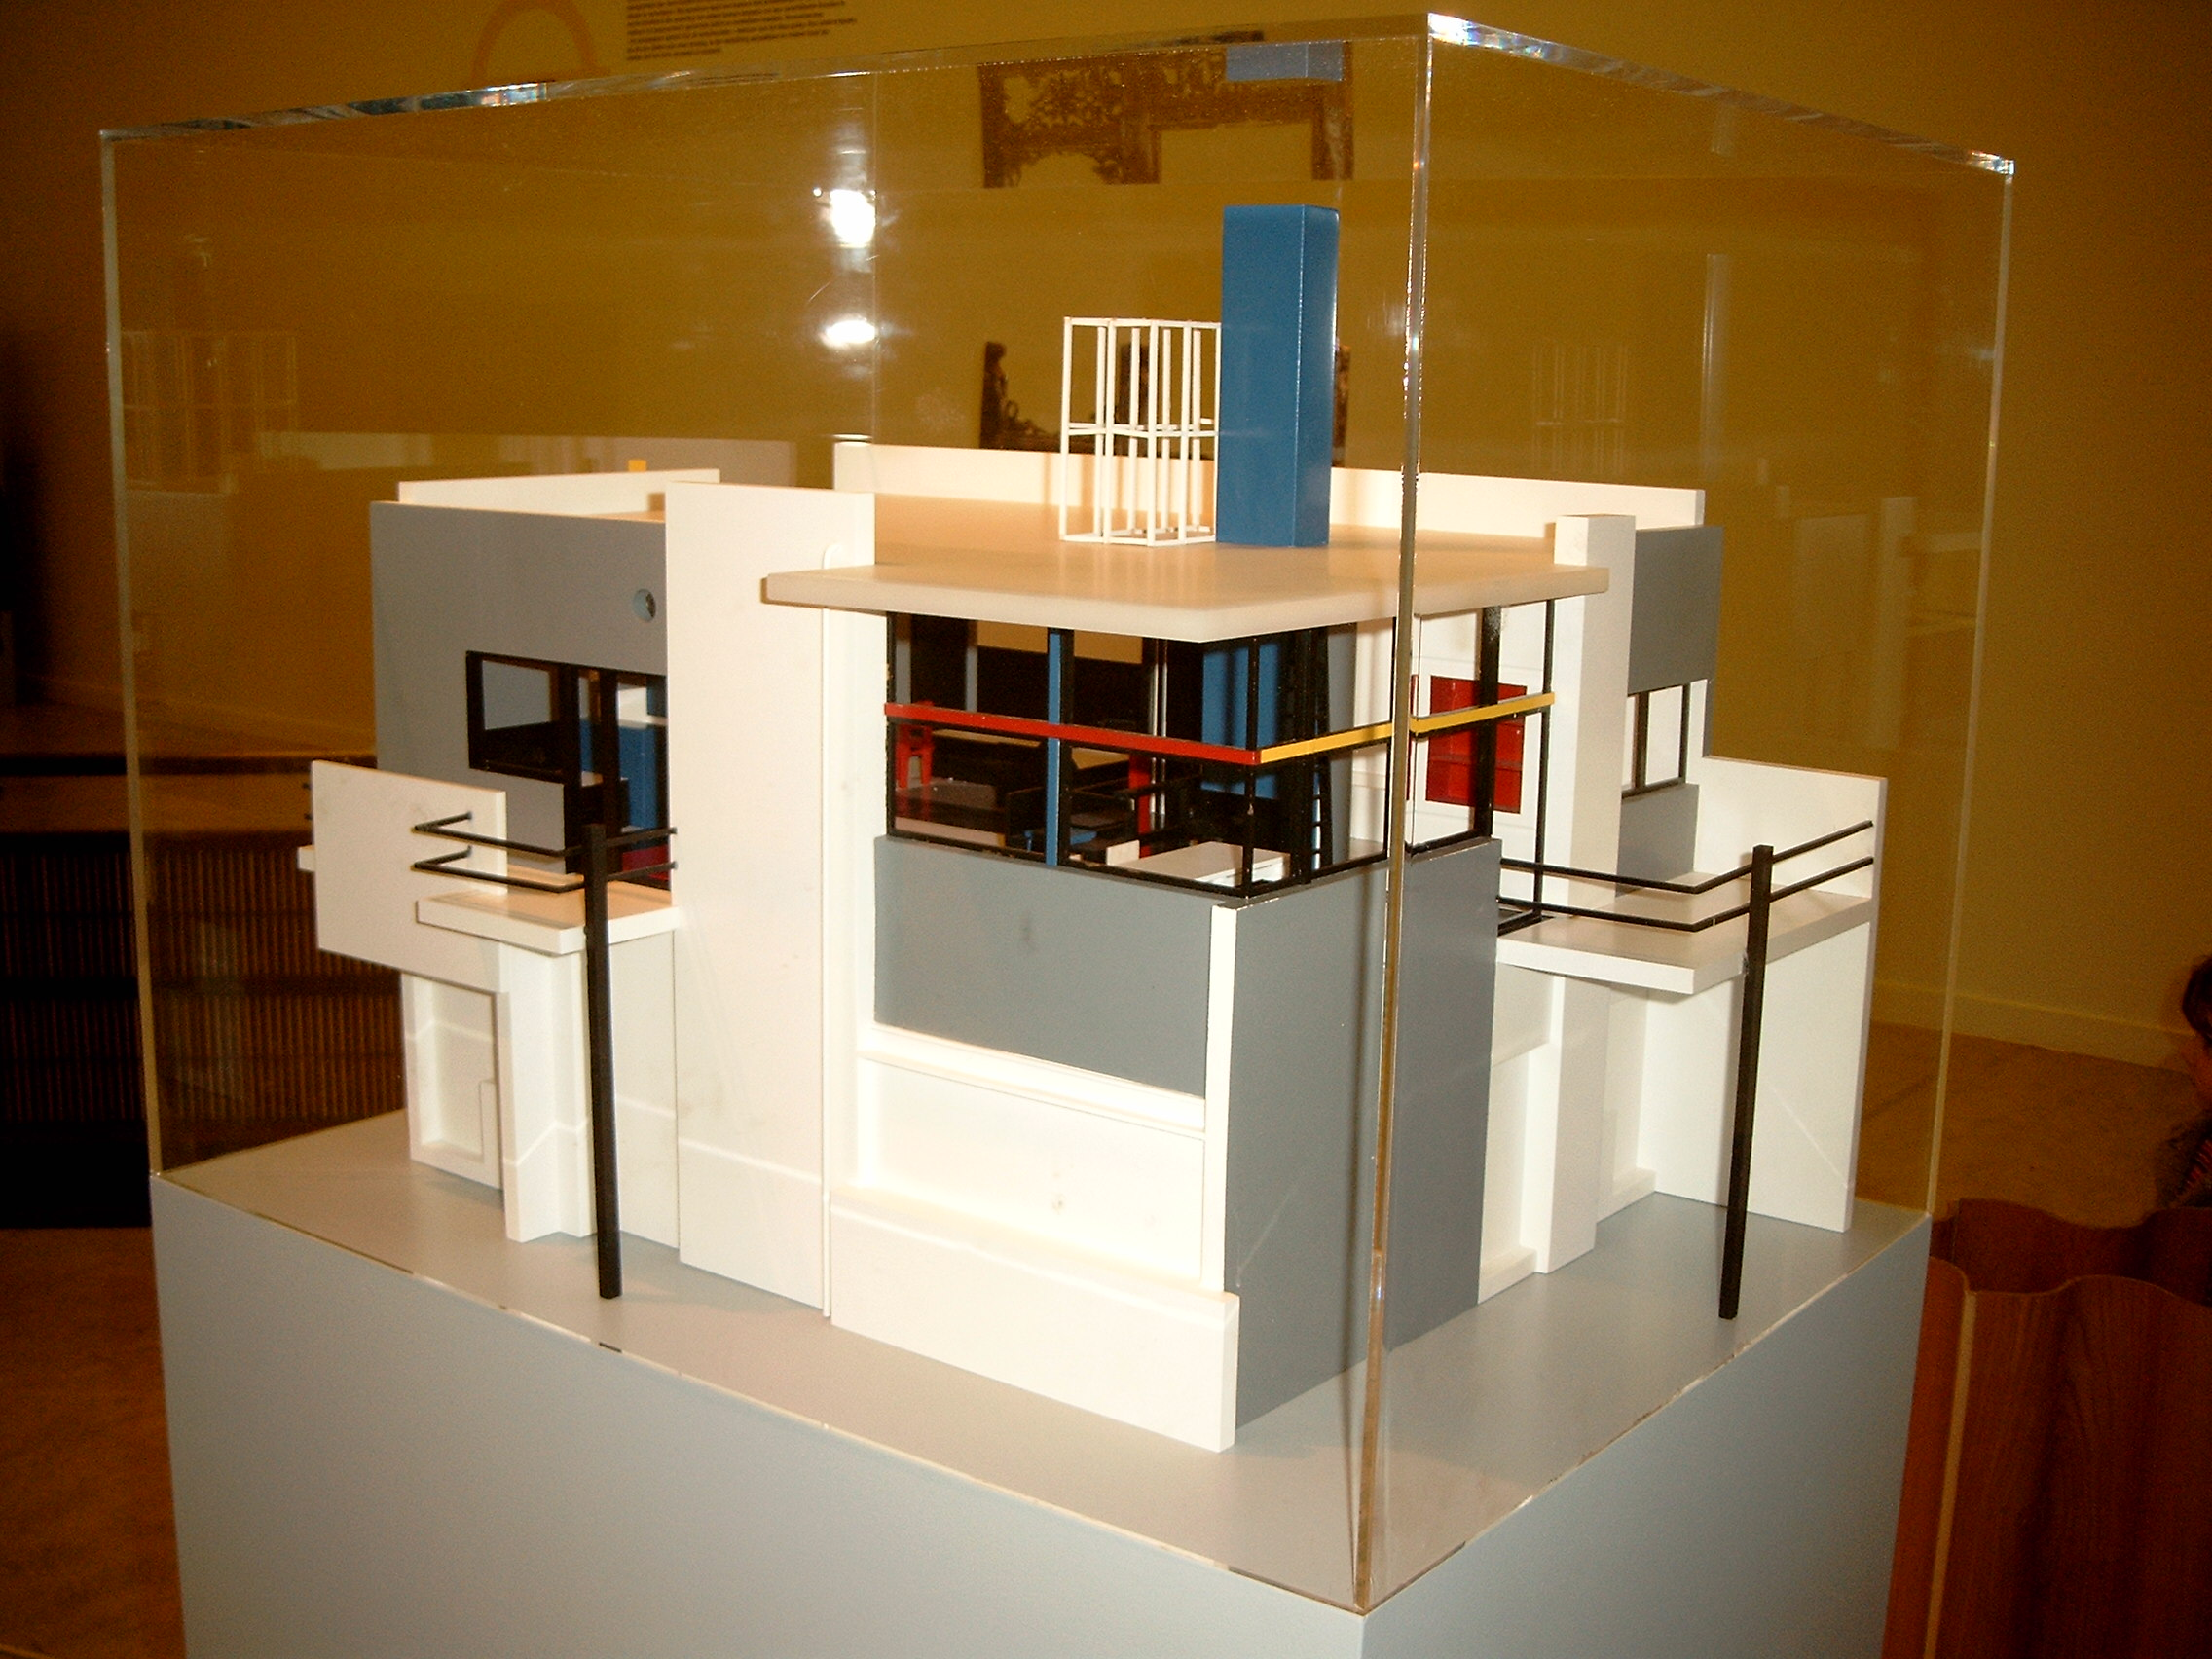 ap rietveld schroder house. Black Bedroom Furniture Sets. Home Design Ideas